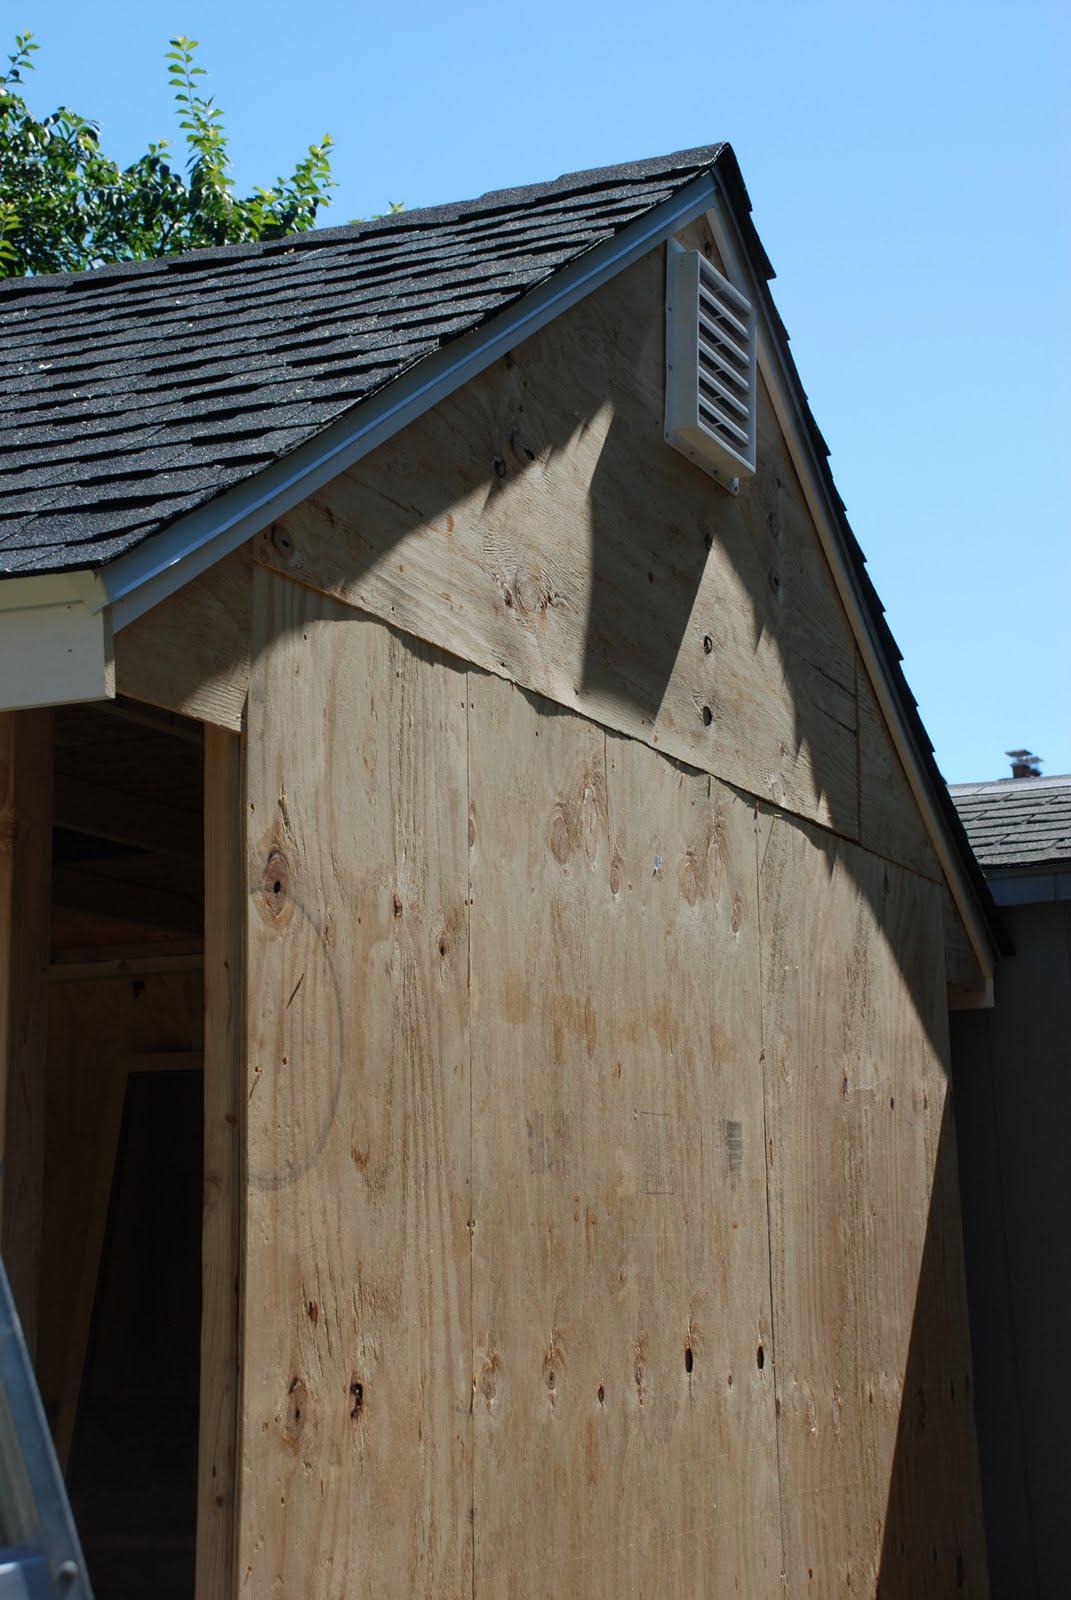 Half gable shed plans 8x10x12x14x16x18x20x22x24 josep for Gable sheds